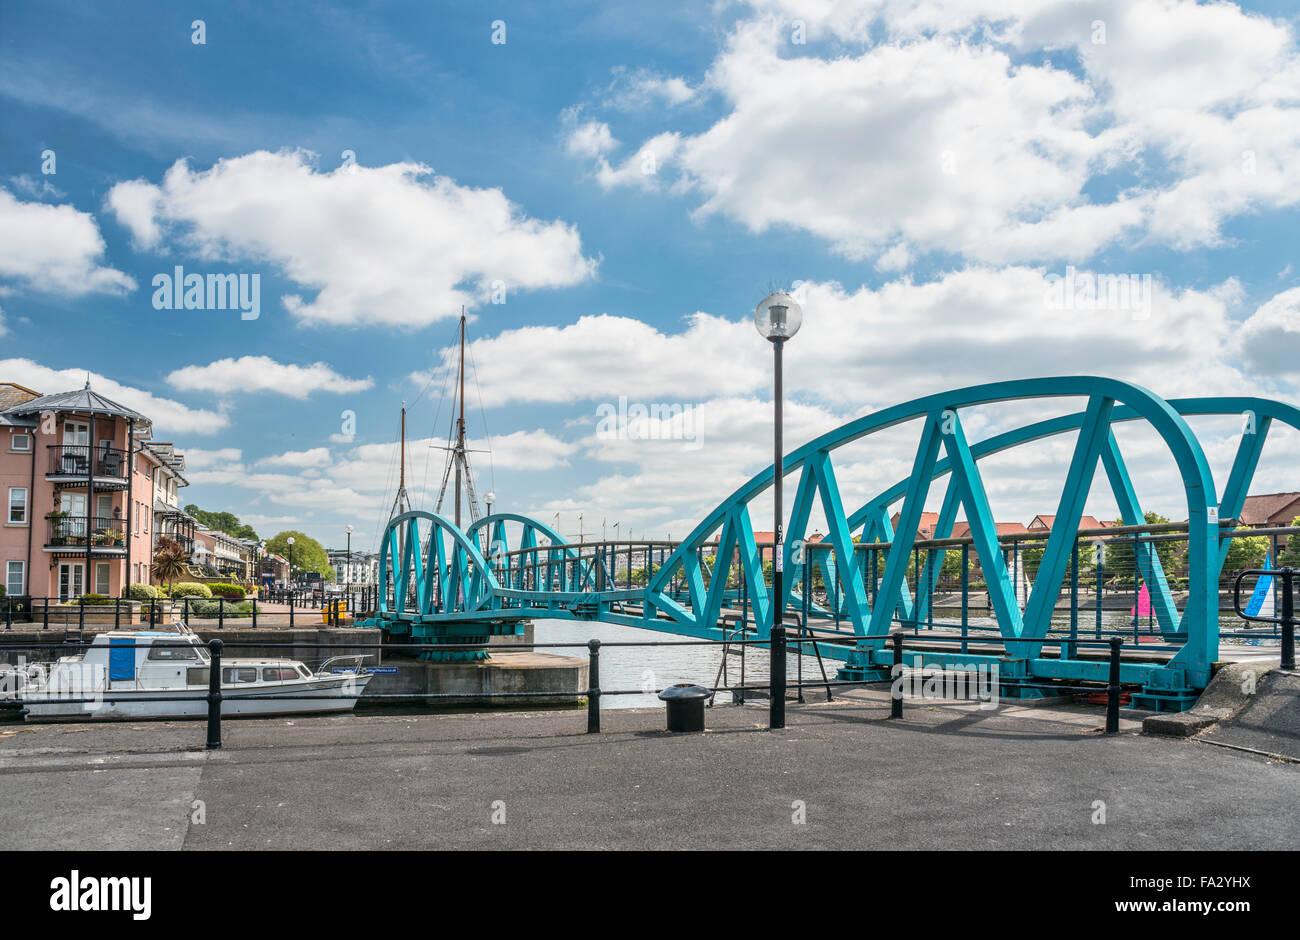 Verrouillage à la jonction pont port flottant, Bristol, Somerset, England, UK Banque D'Images